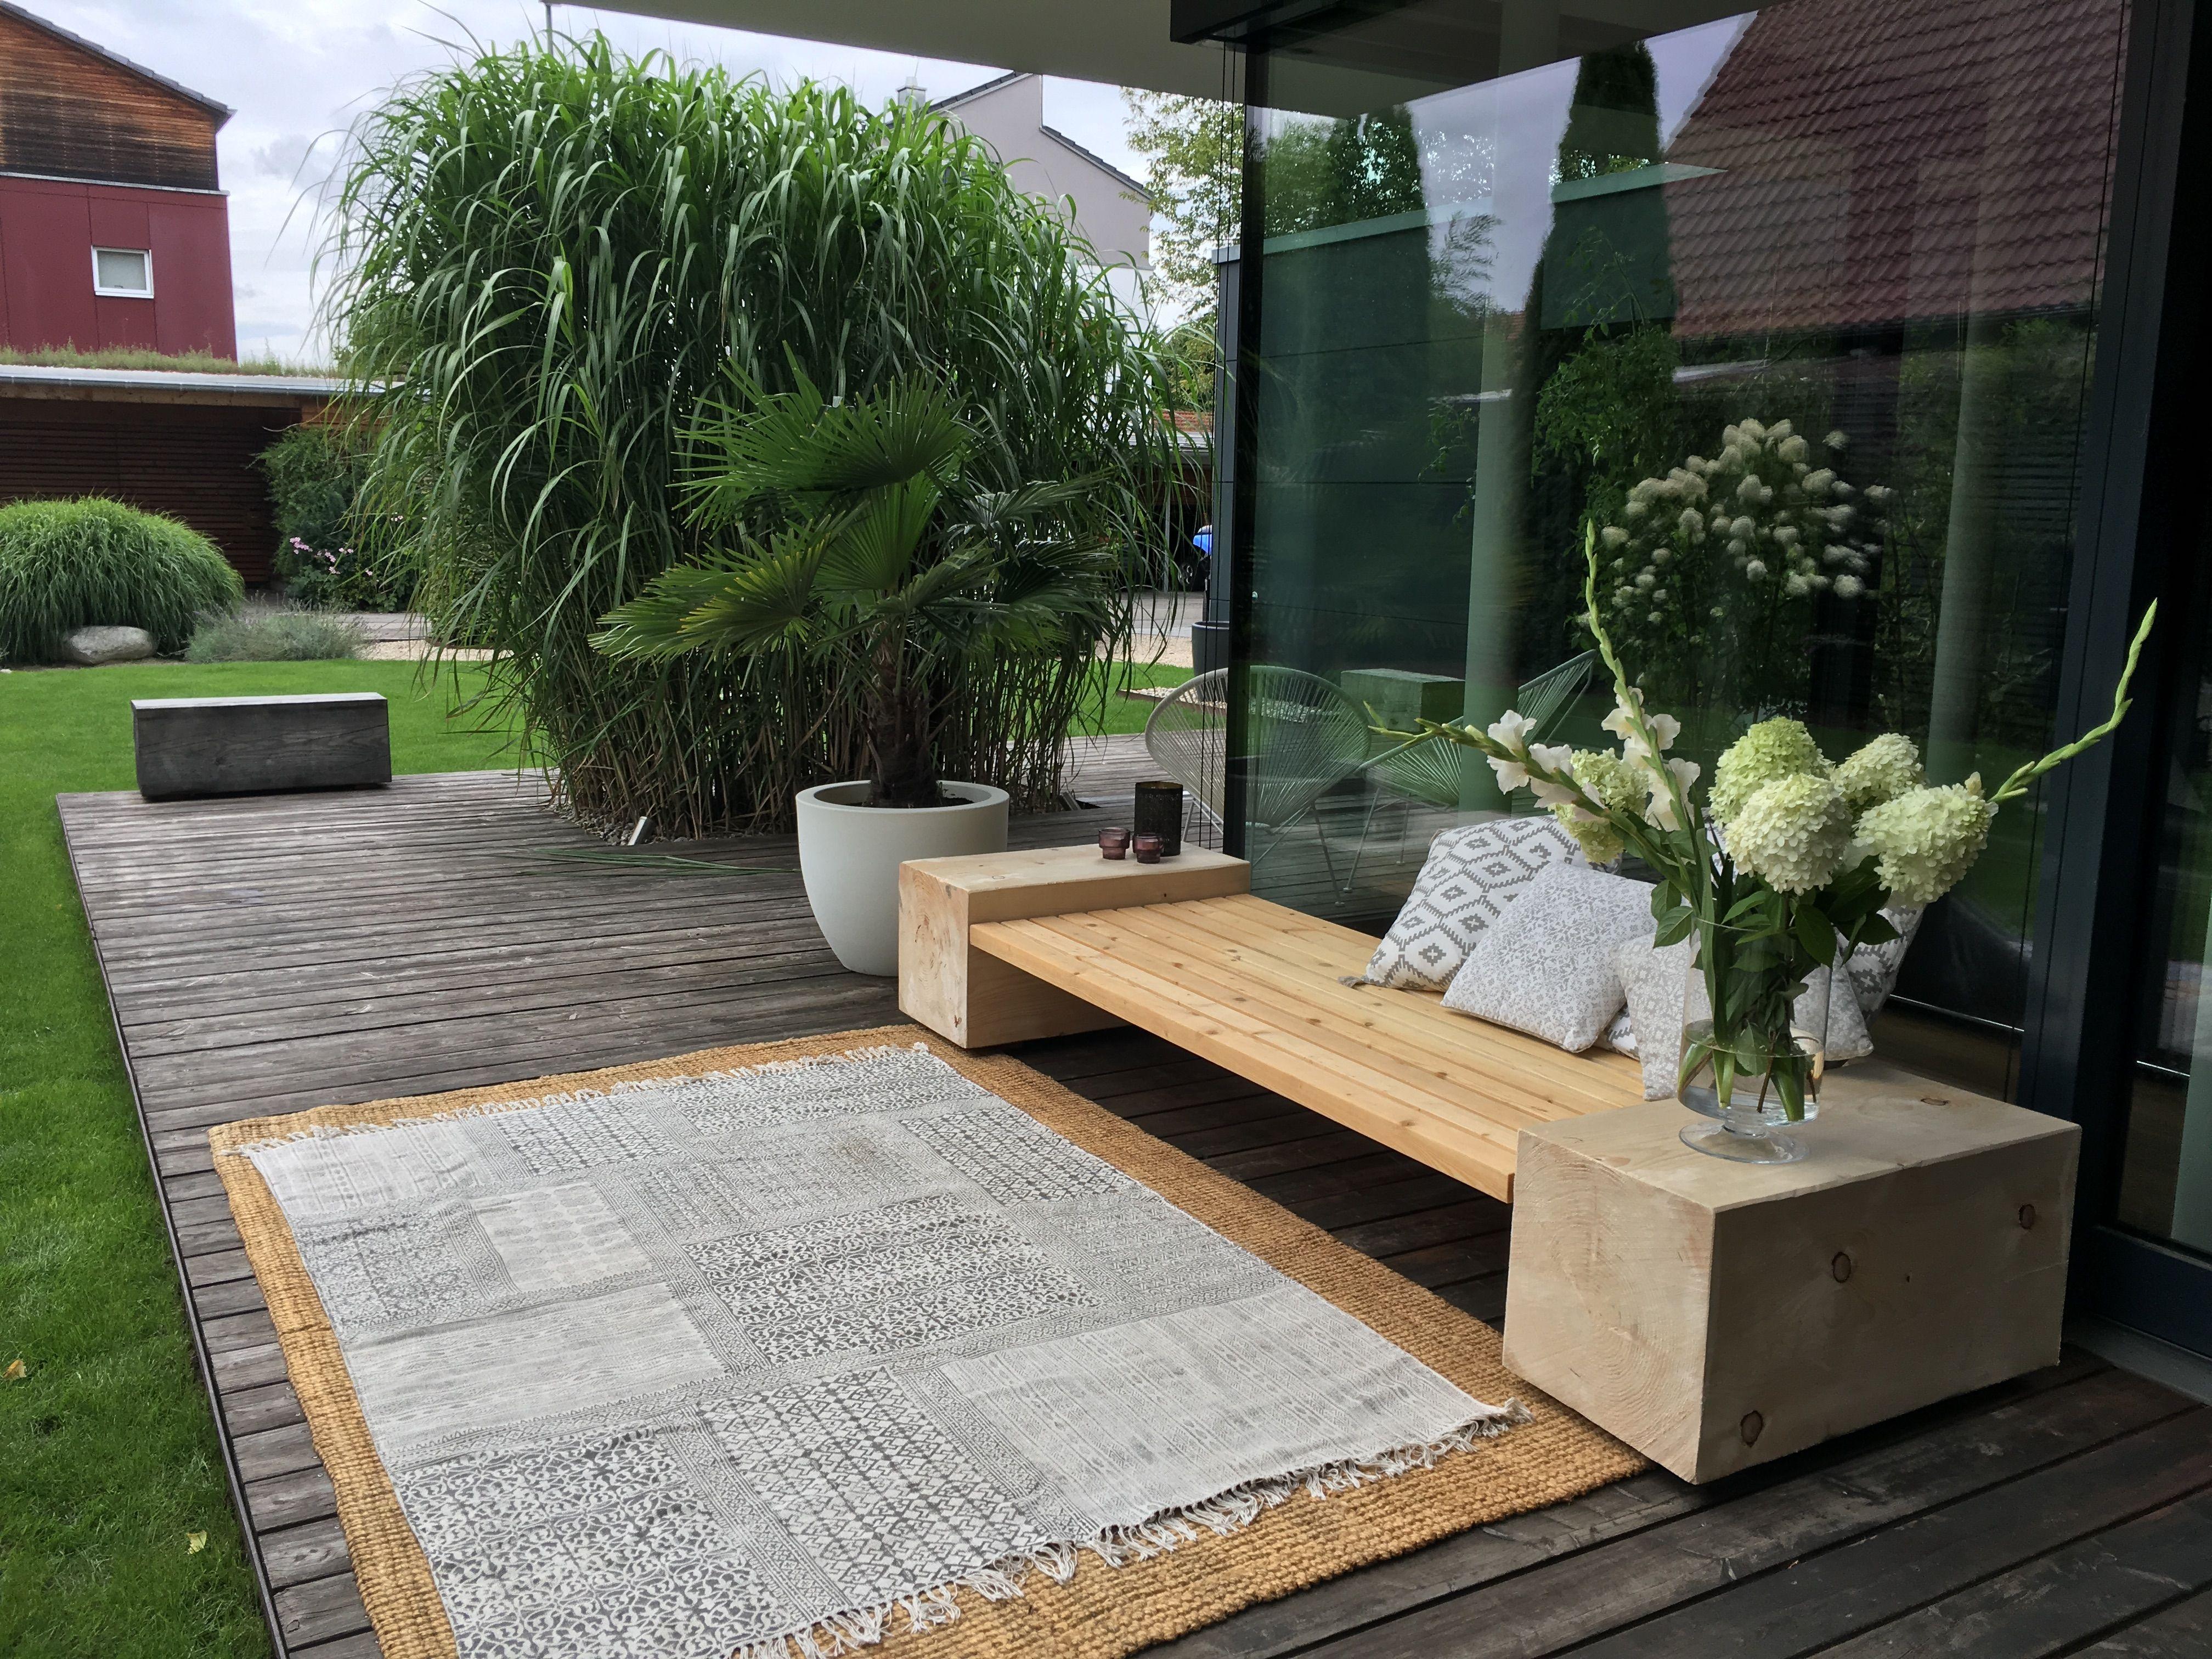 Lounge Architektur-büro merbach, Moderne Architektur ...